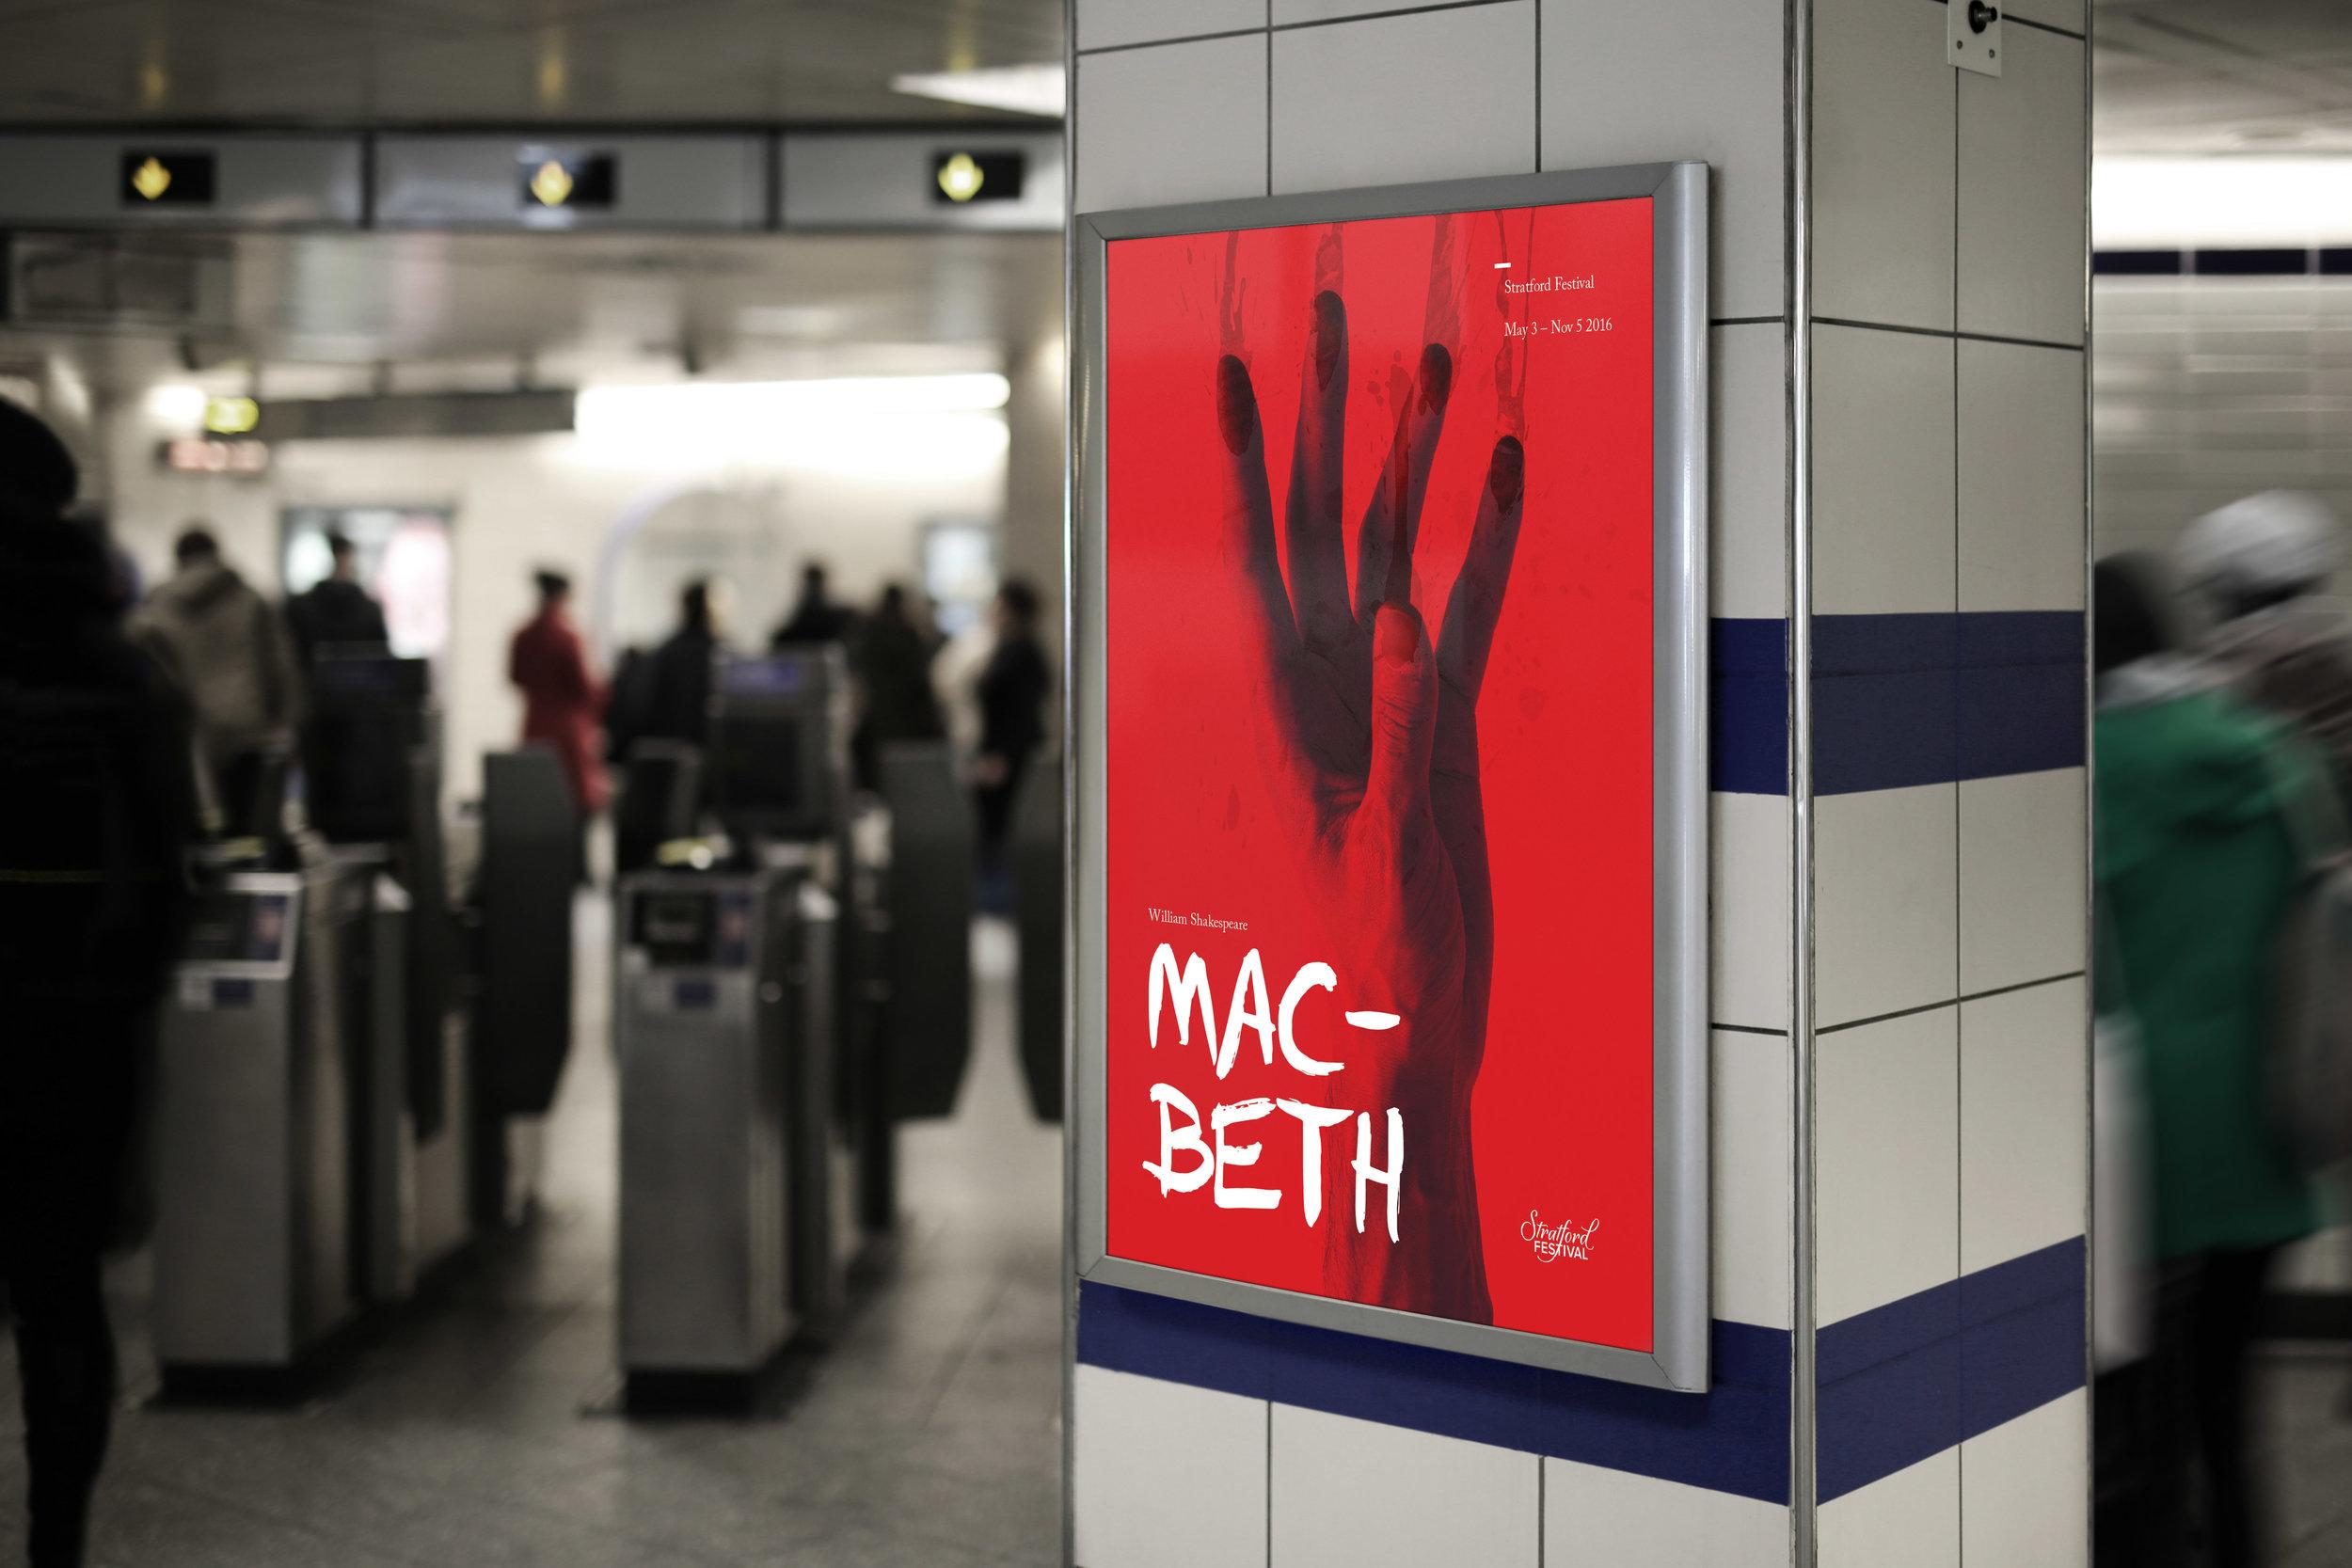 Macbeth - Subway